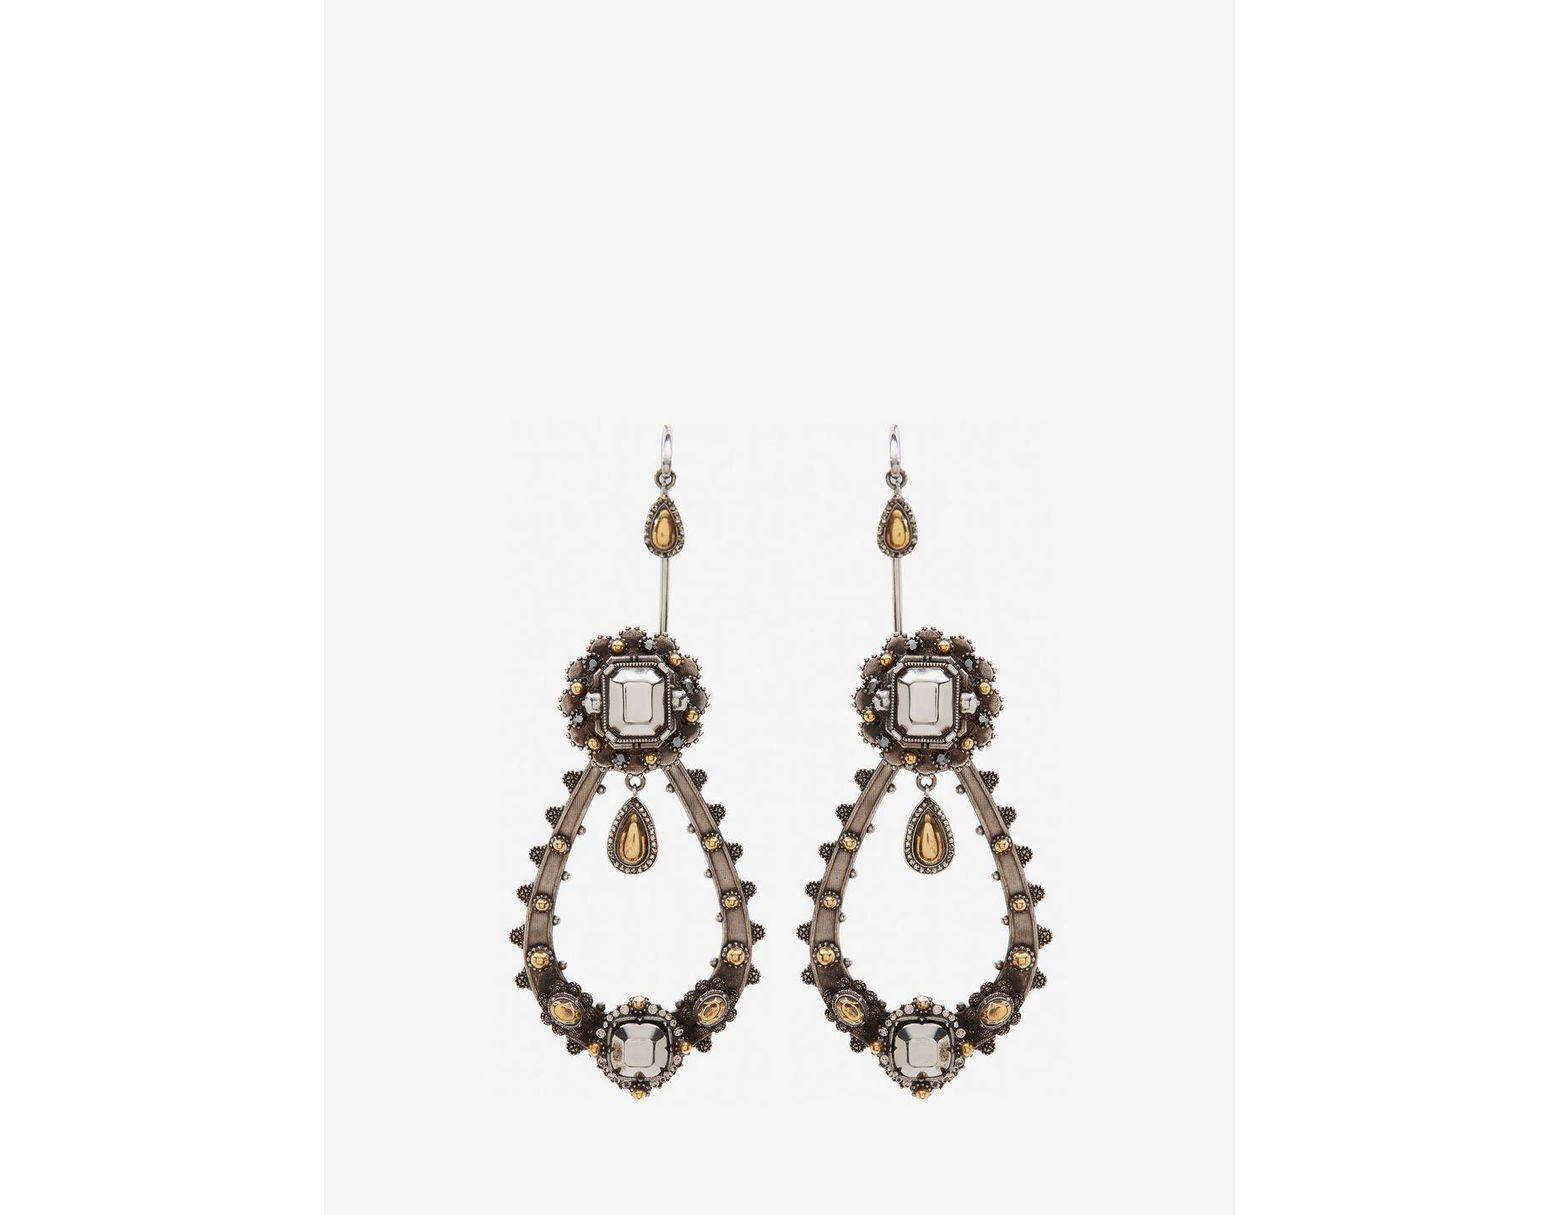 fef7a7c9d Alexander McQueen Metallic Armour Earrings in Metallic - Save 40% - Lyst